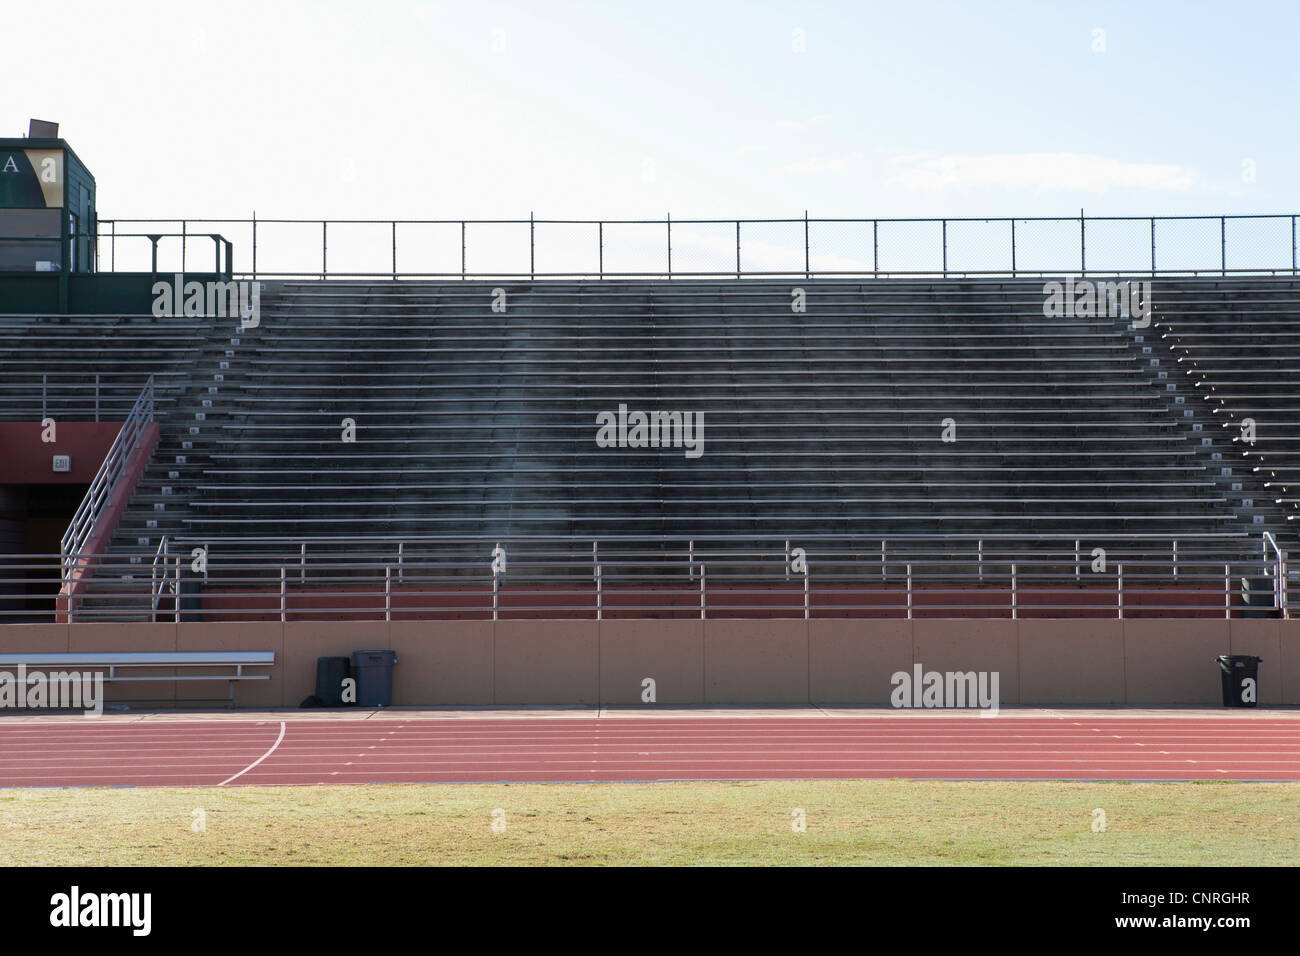 Empty stadium and running track - Stock Image